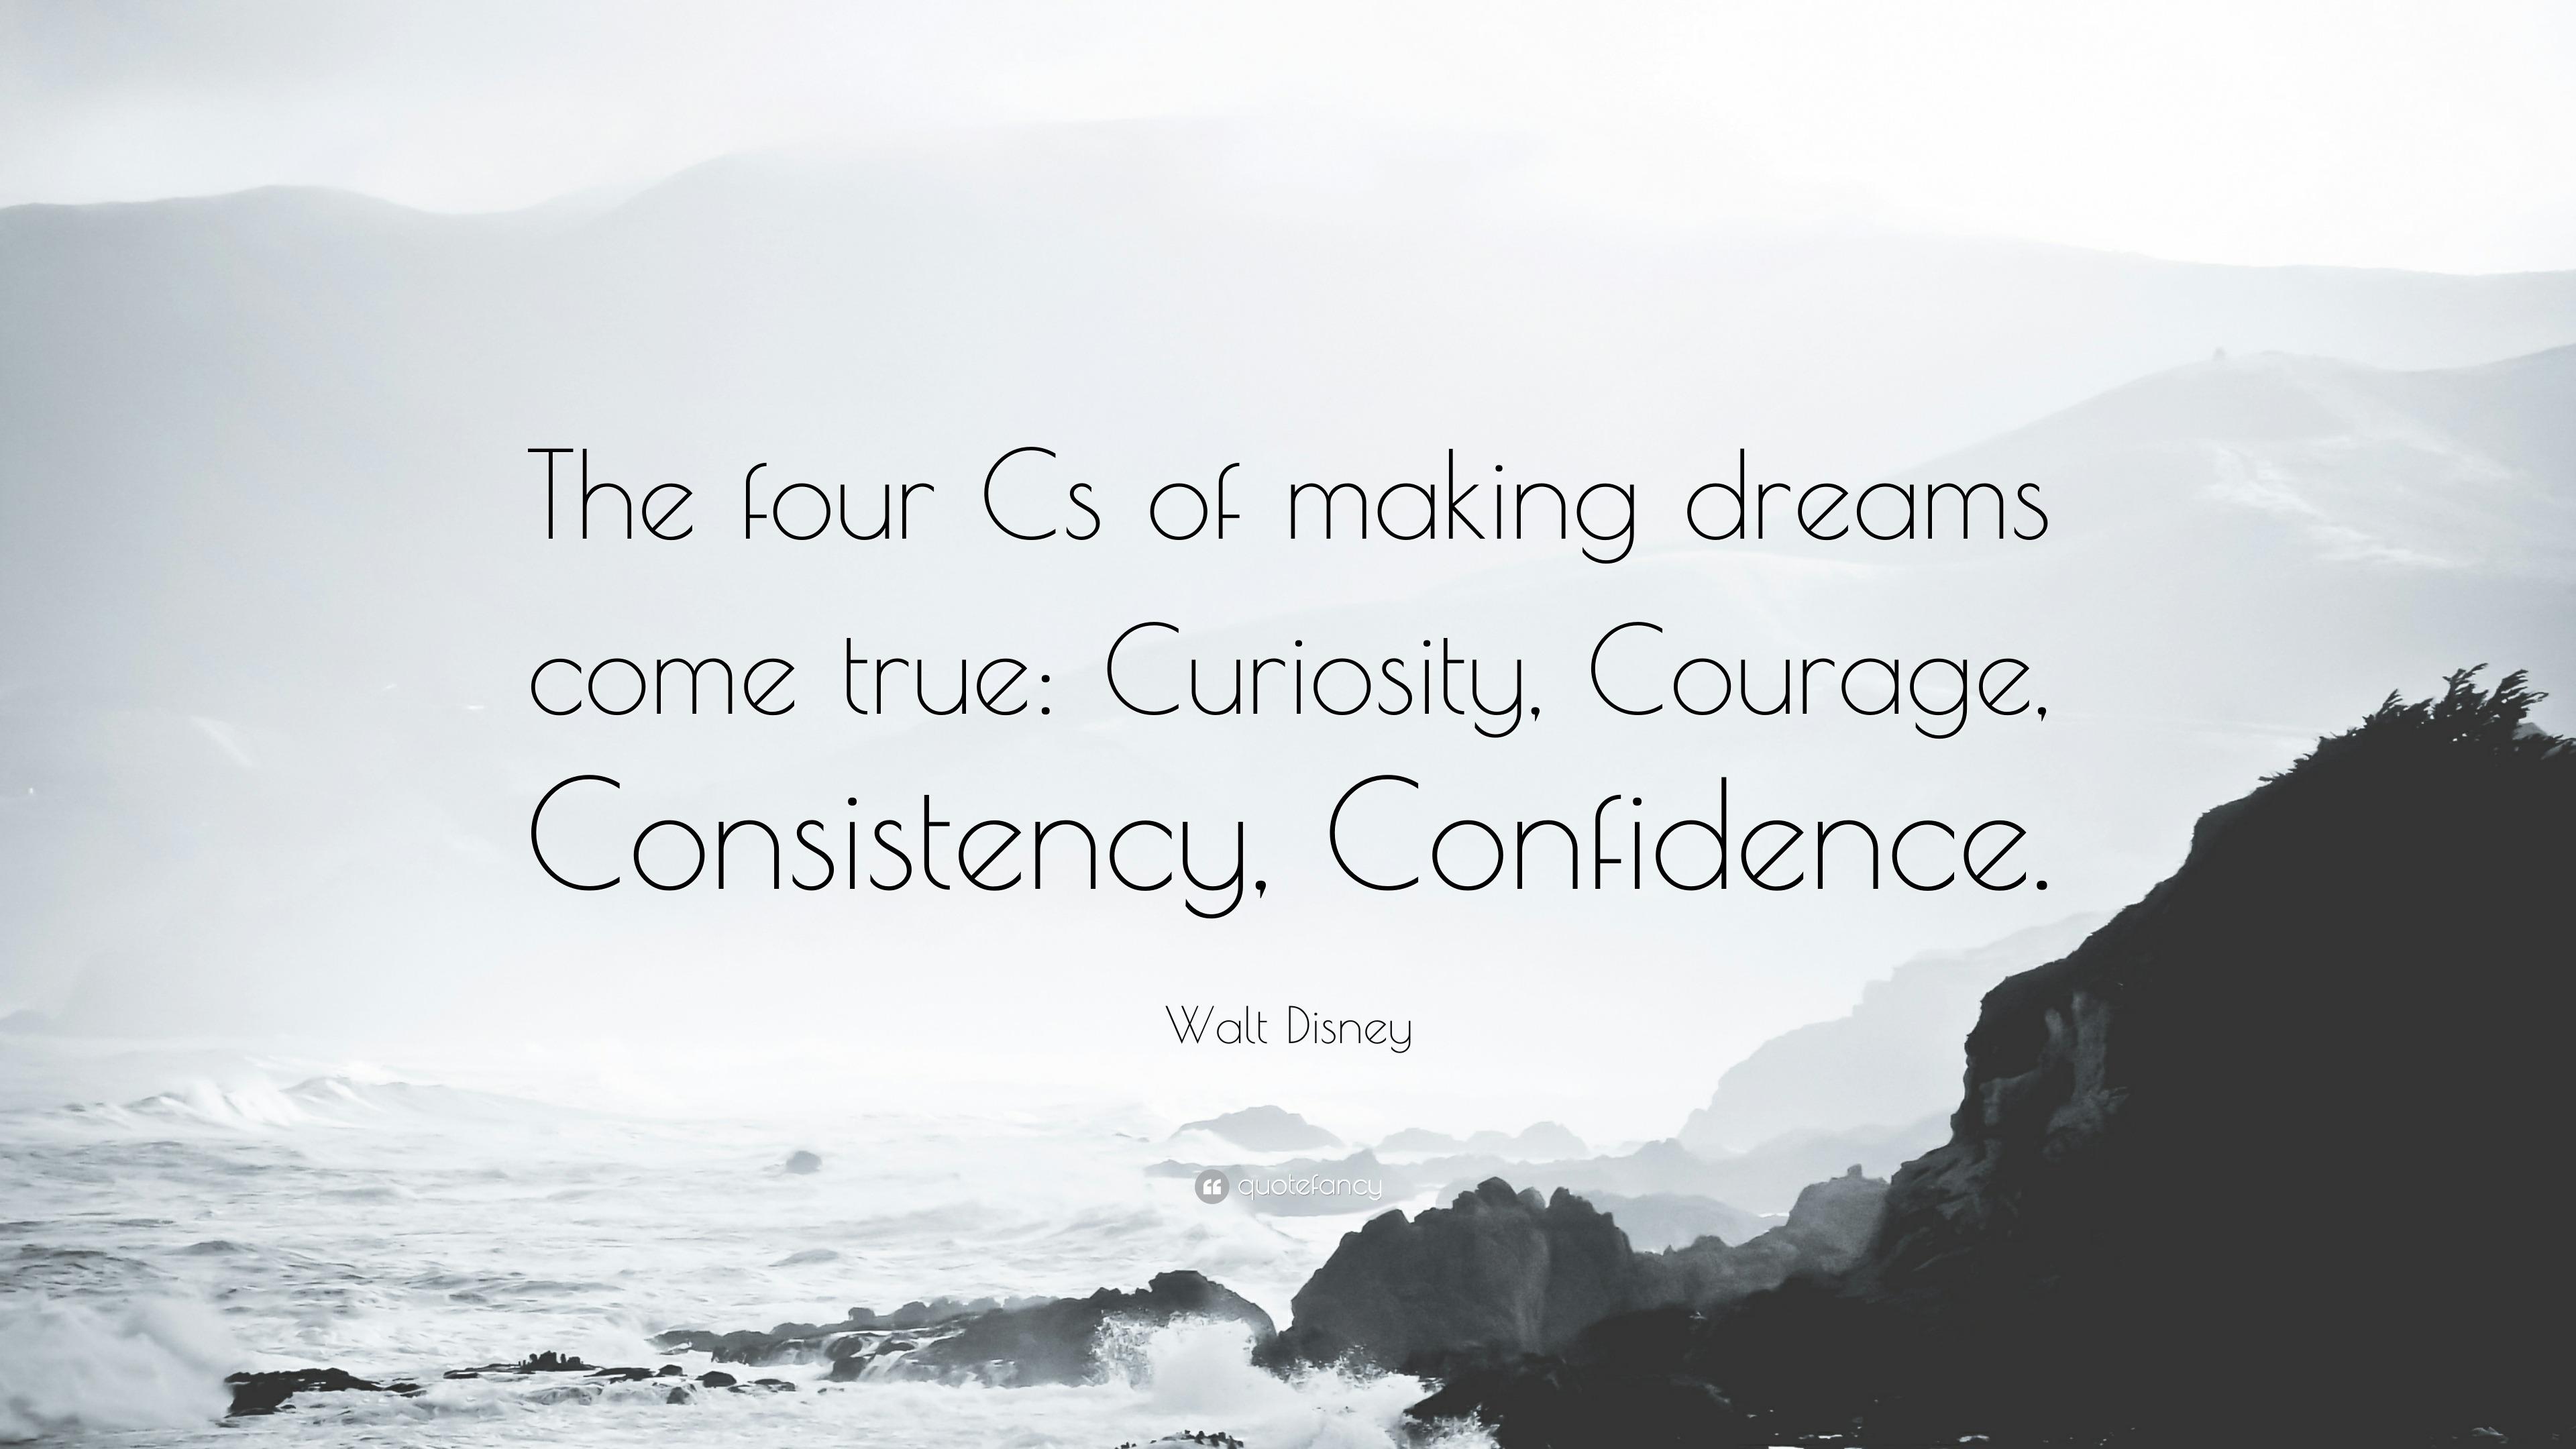 Walt Disney Quote The Four Cs Of Making Dreams Come True